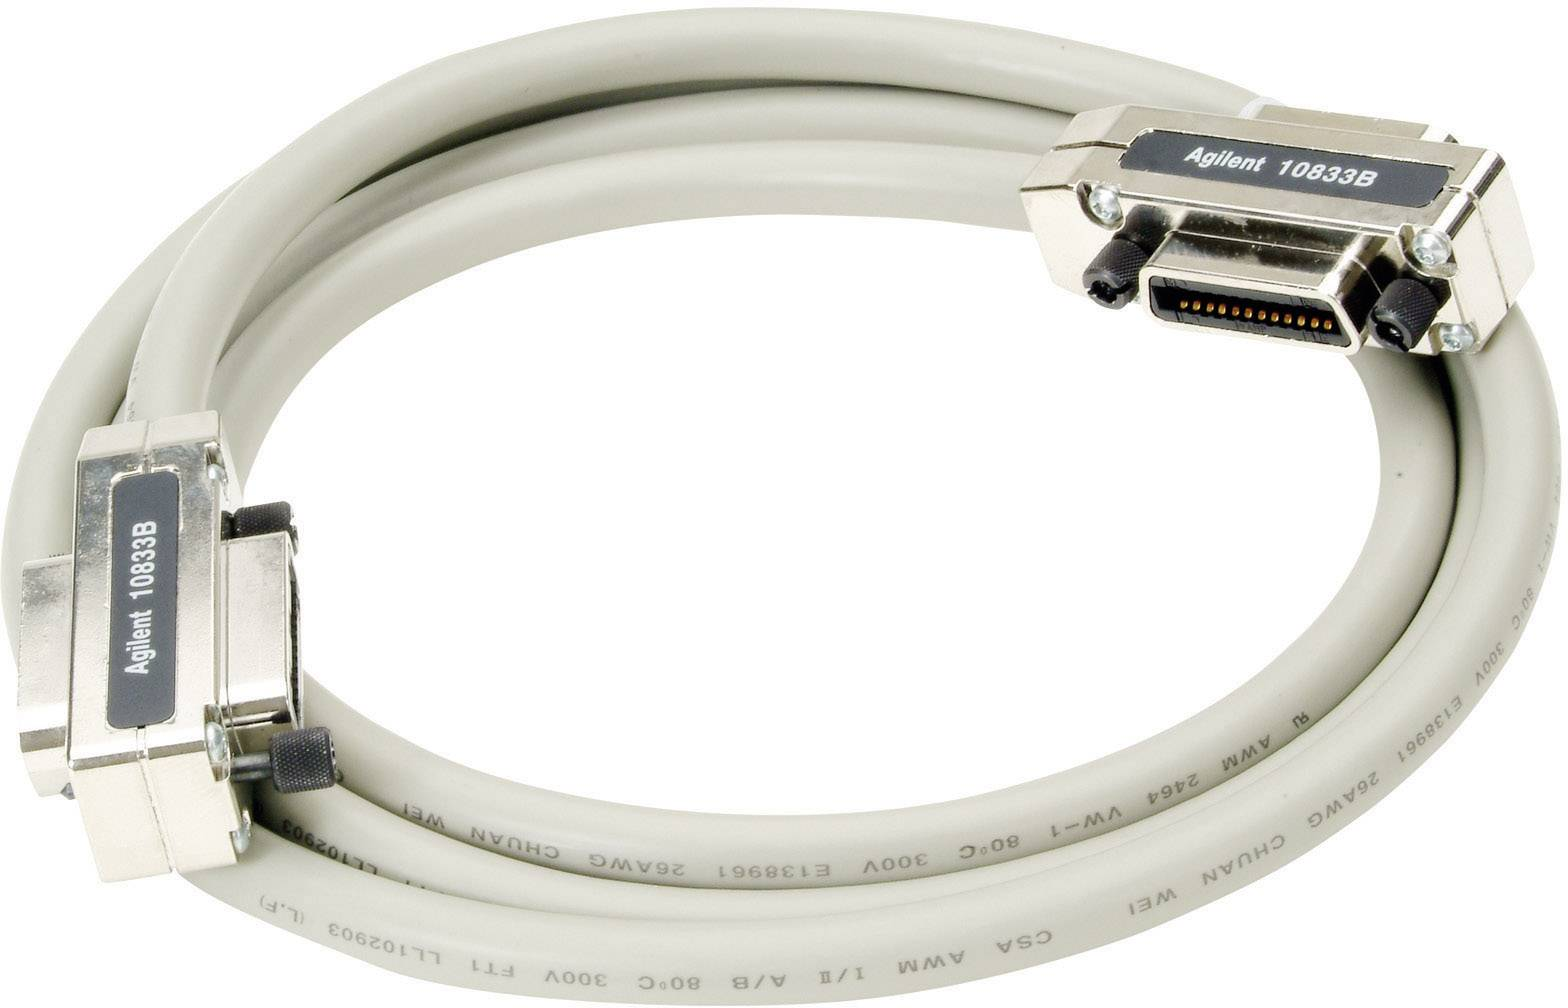 Kábel Agilent Technologies 10833B, 2 m